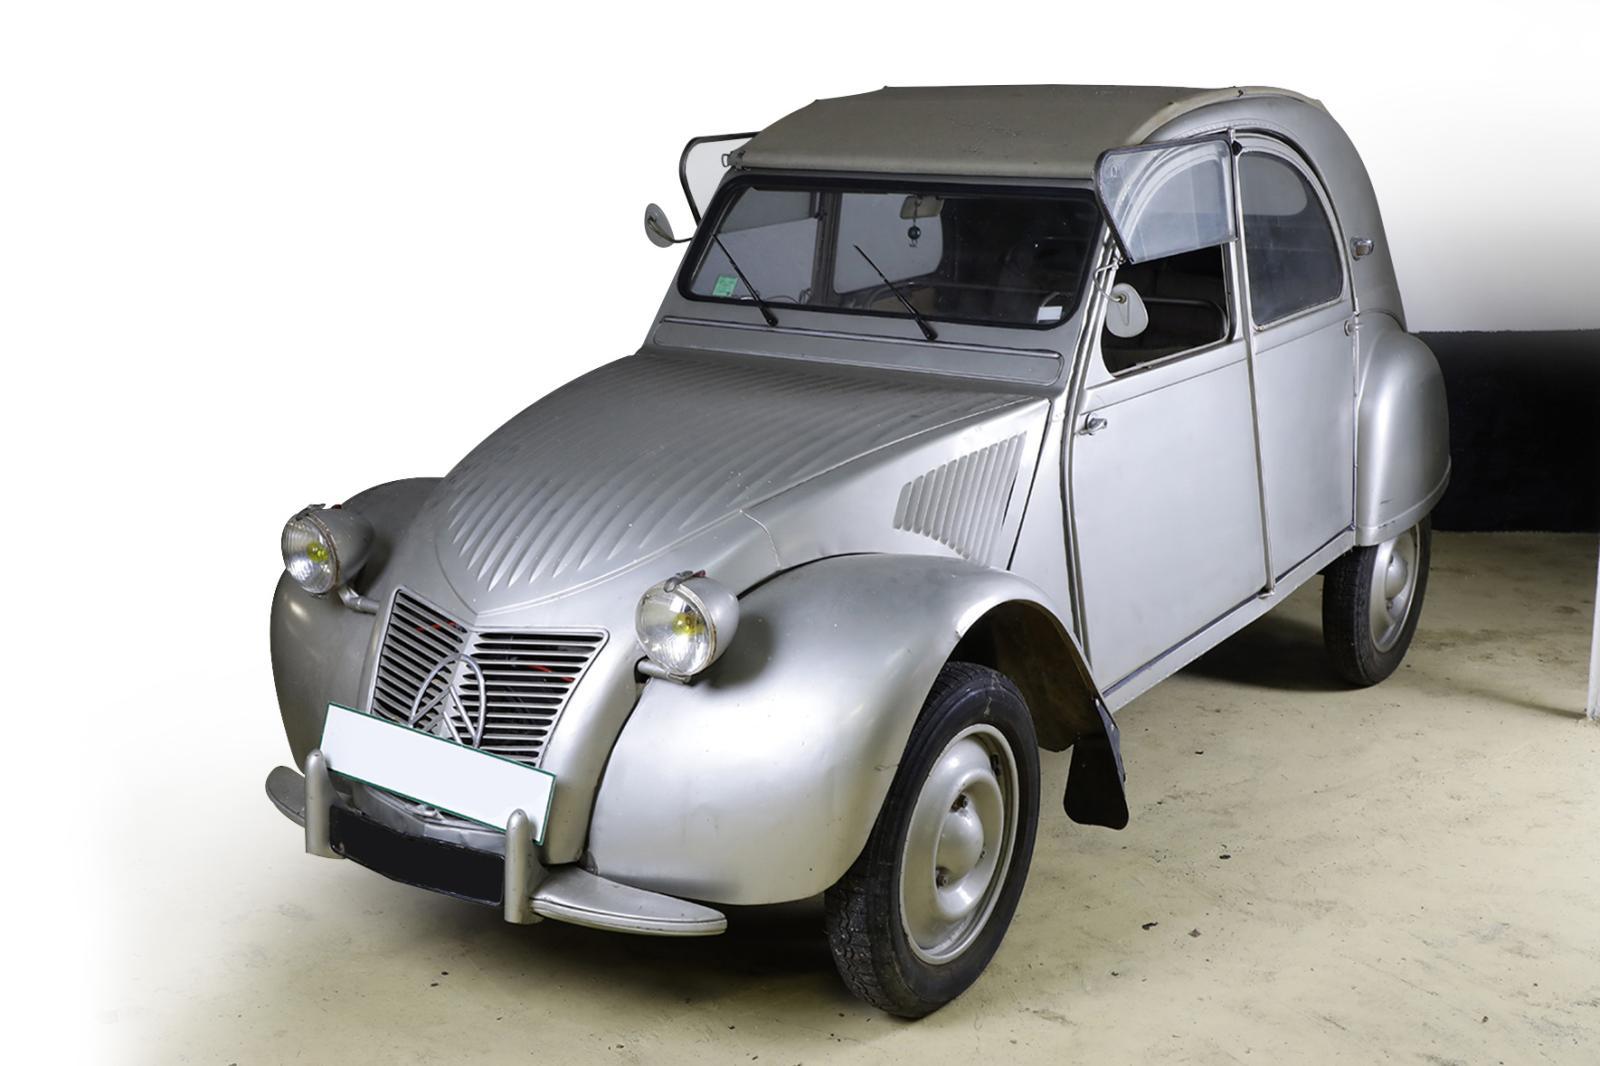 Citroën 2CV typeA, 1949, n°19018, châssis n°000458. Fontainebleau, 20janvier 2018. OsenatOVV. Adjugé: 75600€